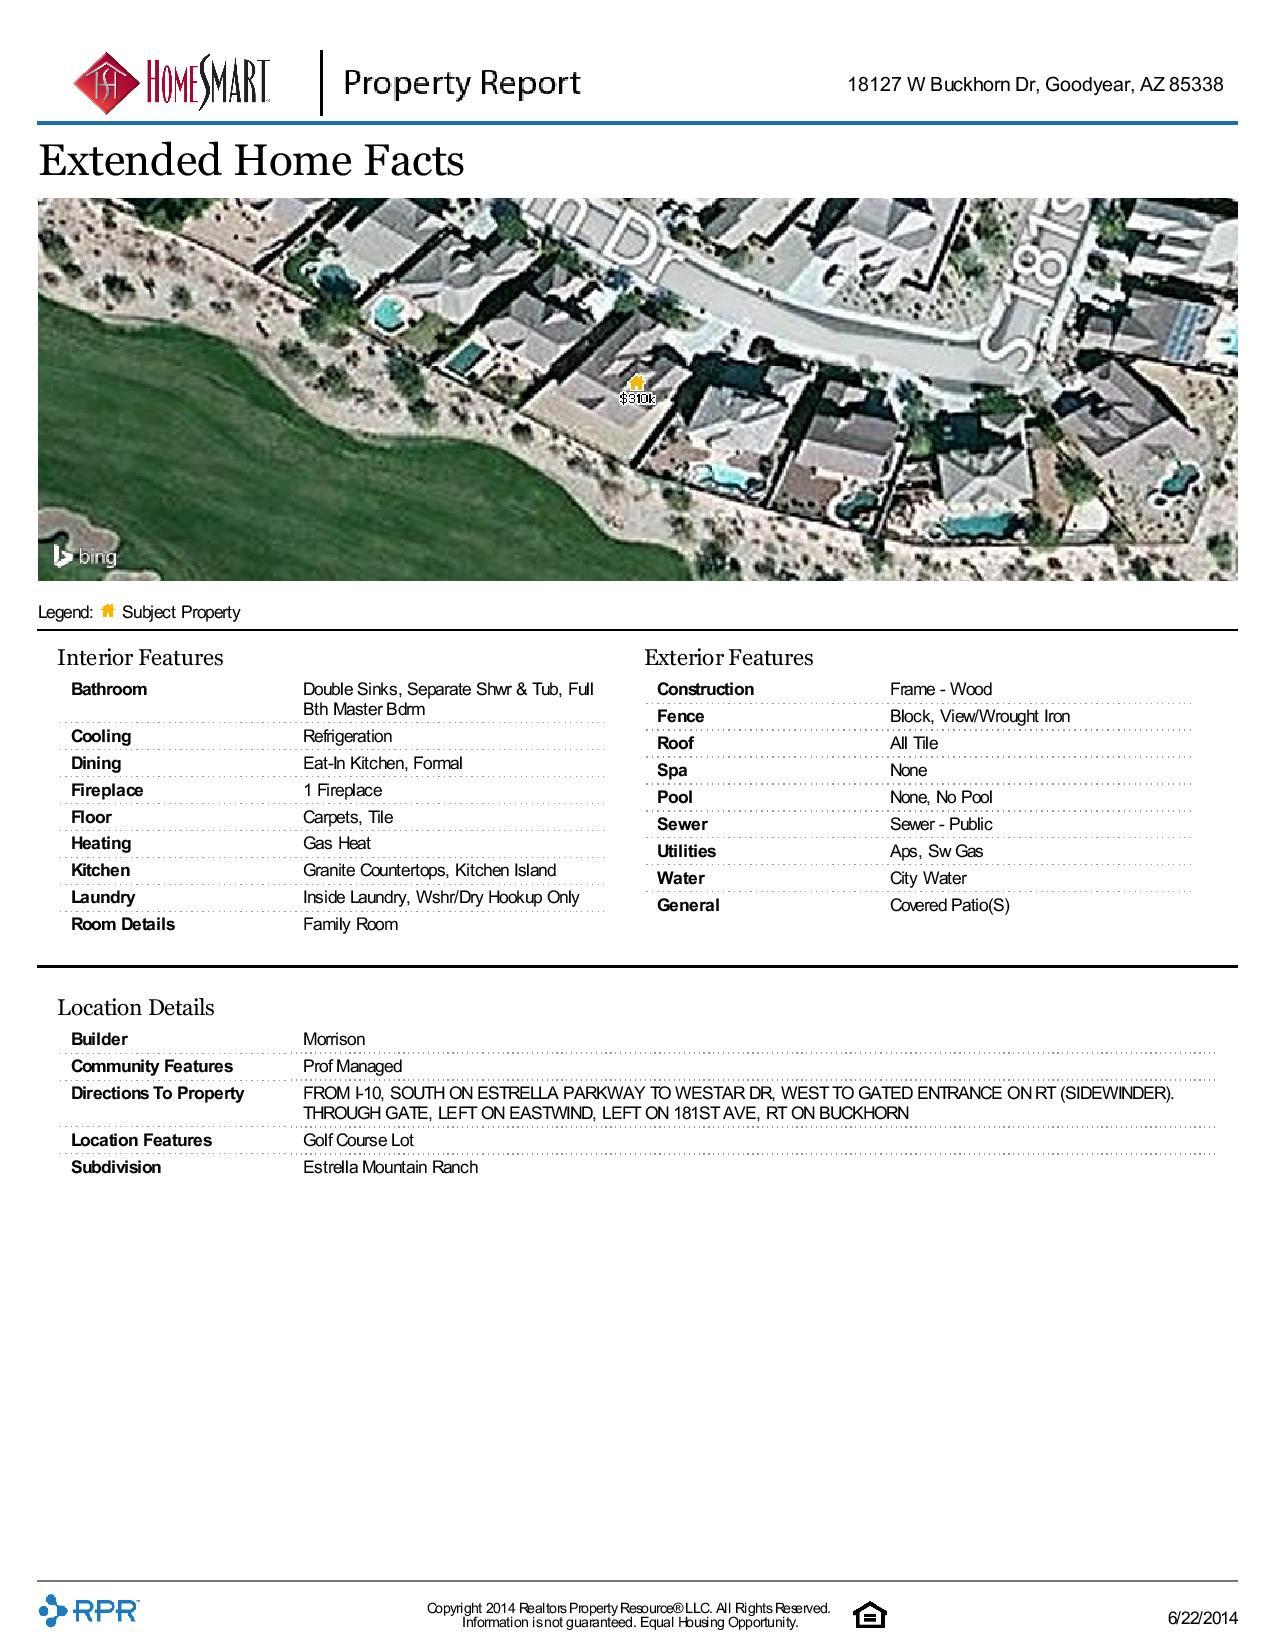 18127-W-Buckhorn-Dr-Goodyear-AZ-85338-page-004